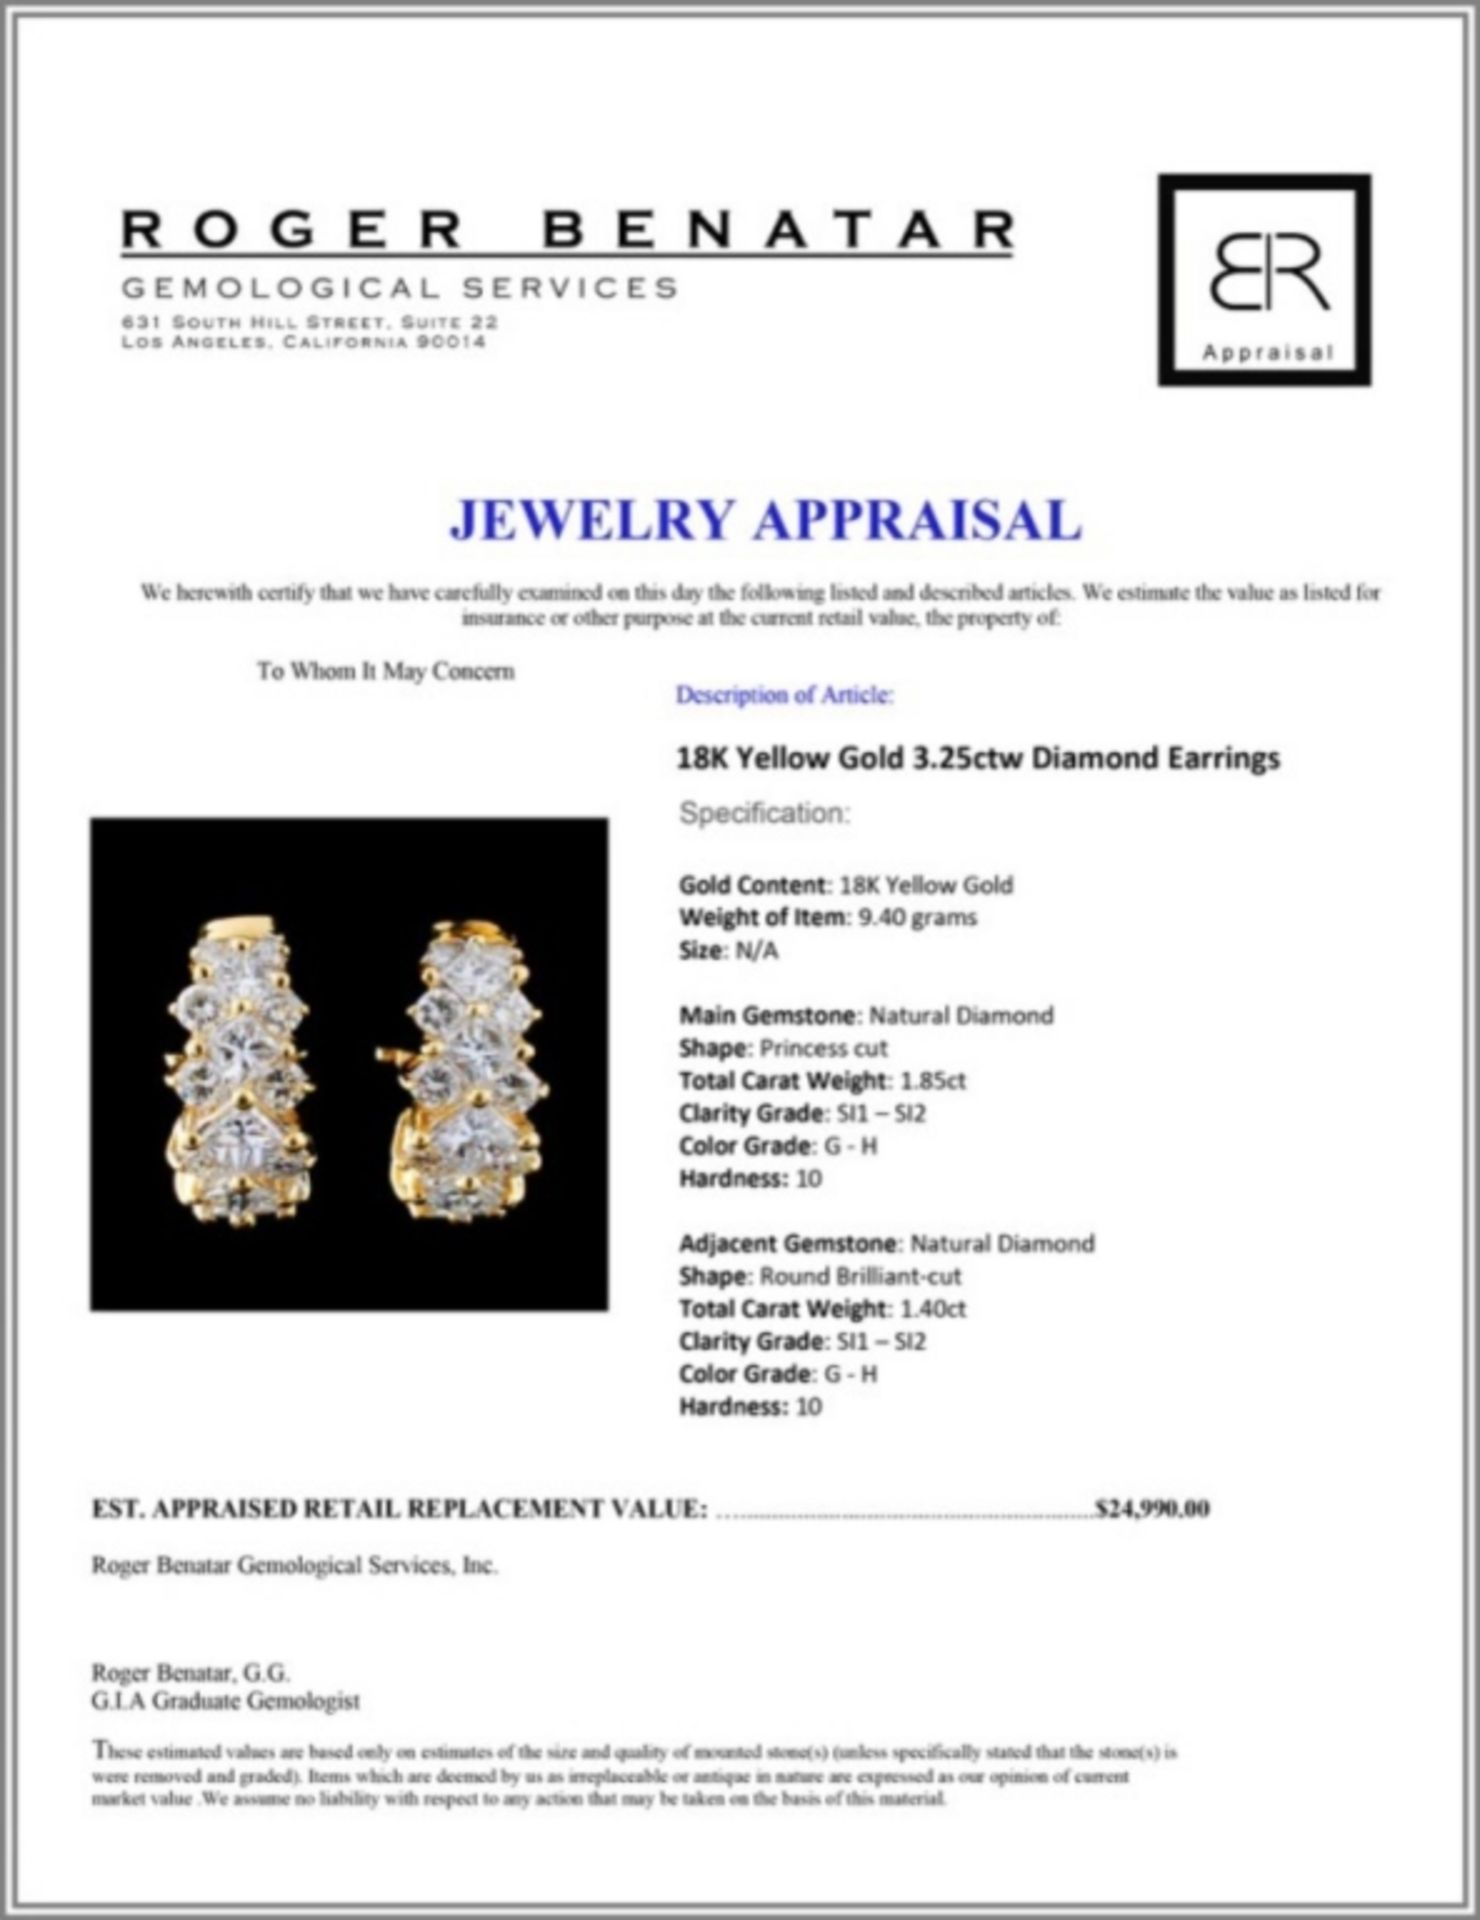 18K Yellow Gold 3.25ctw Diamond Earrings - Image 3 of 3